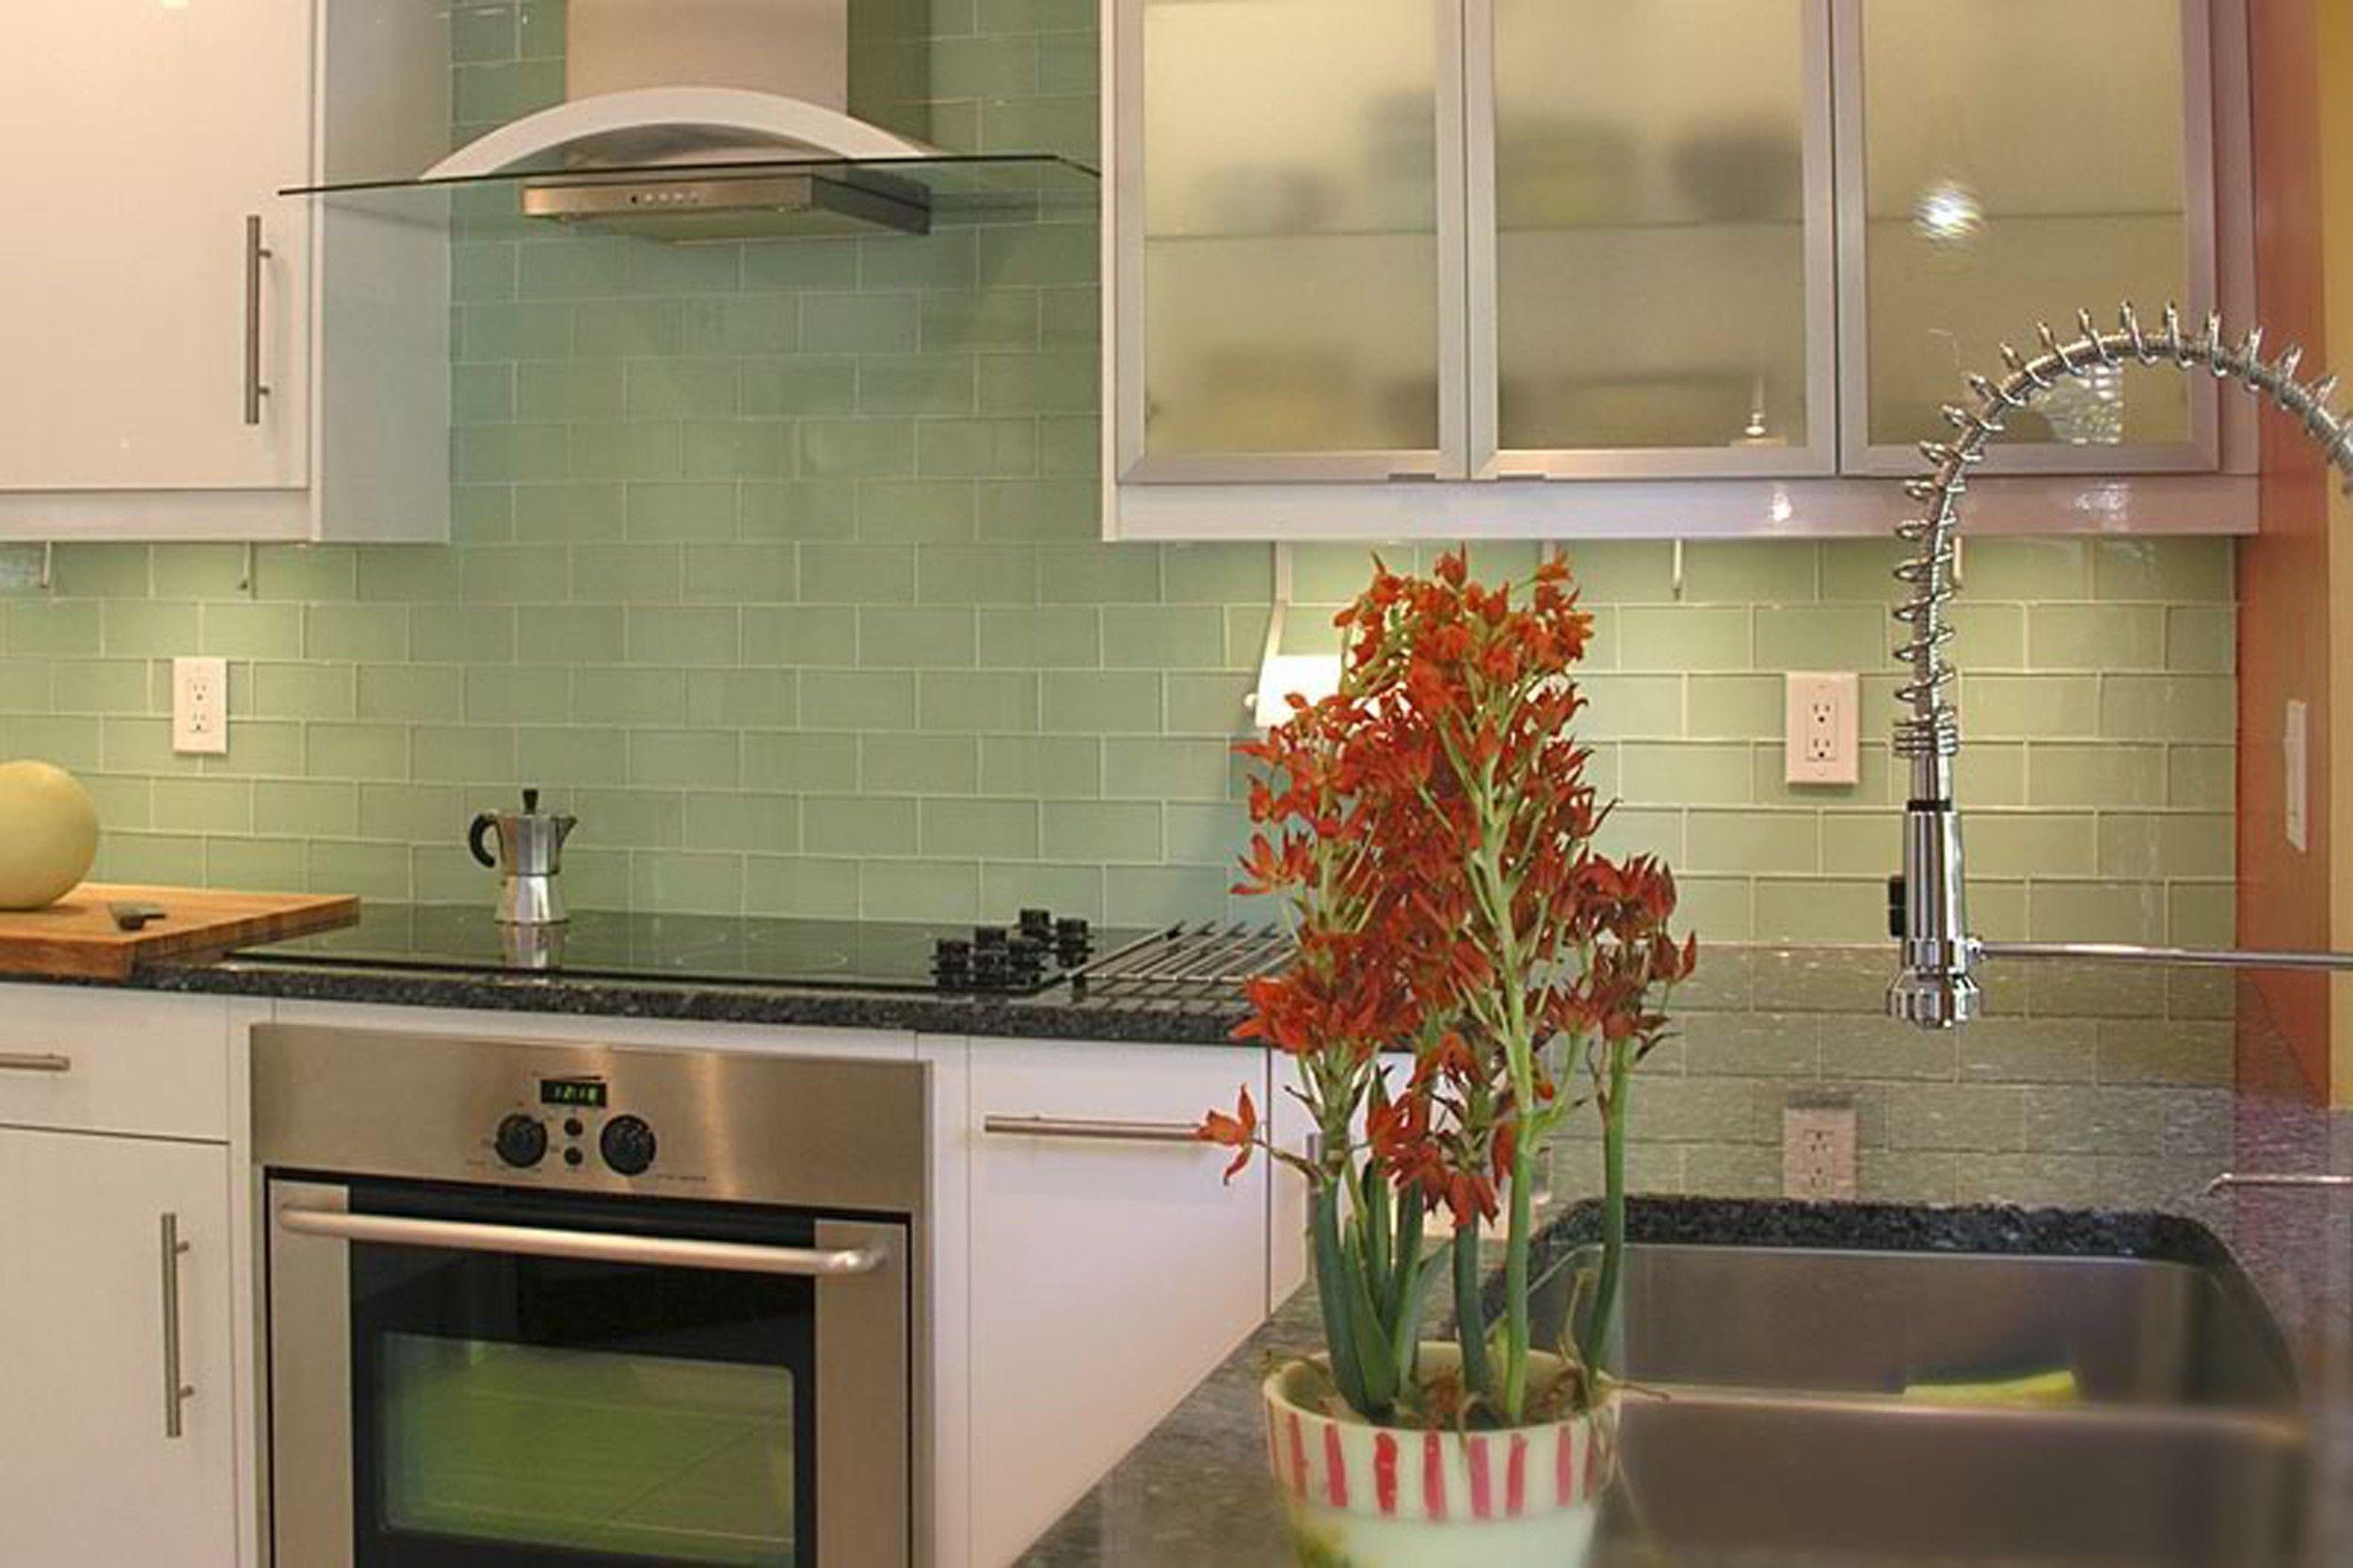 Green Glass Subway Tile In Surf Modwalls Lush 3x6 Tile Modwalls